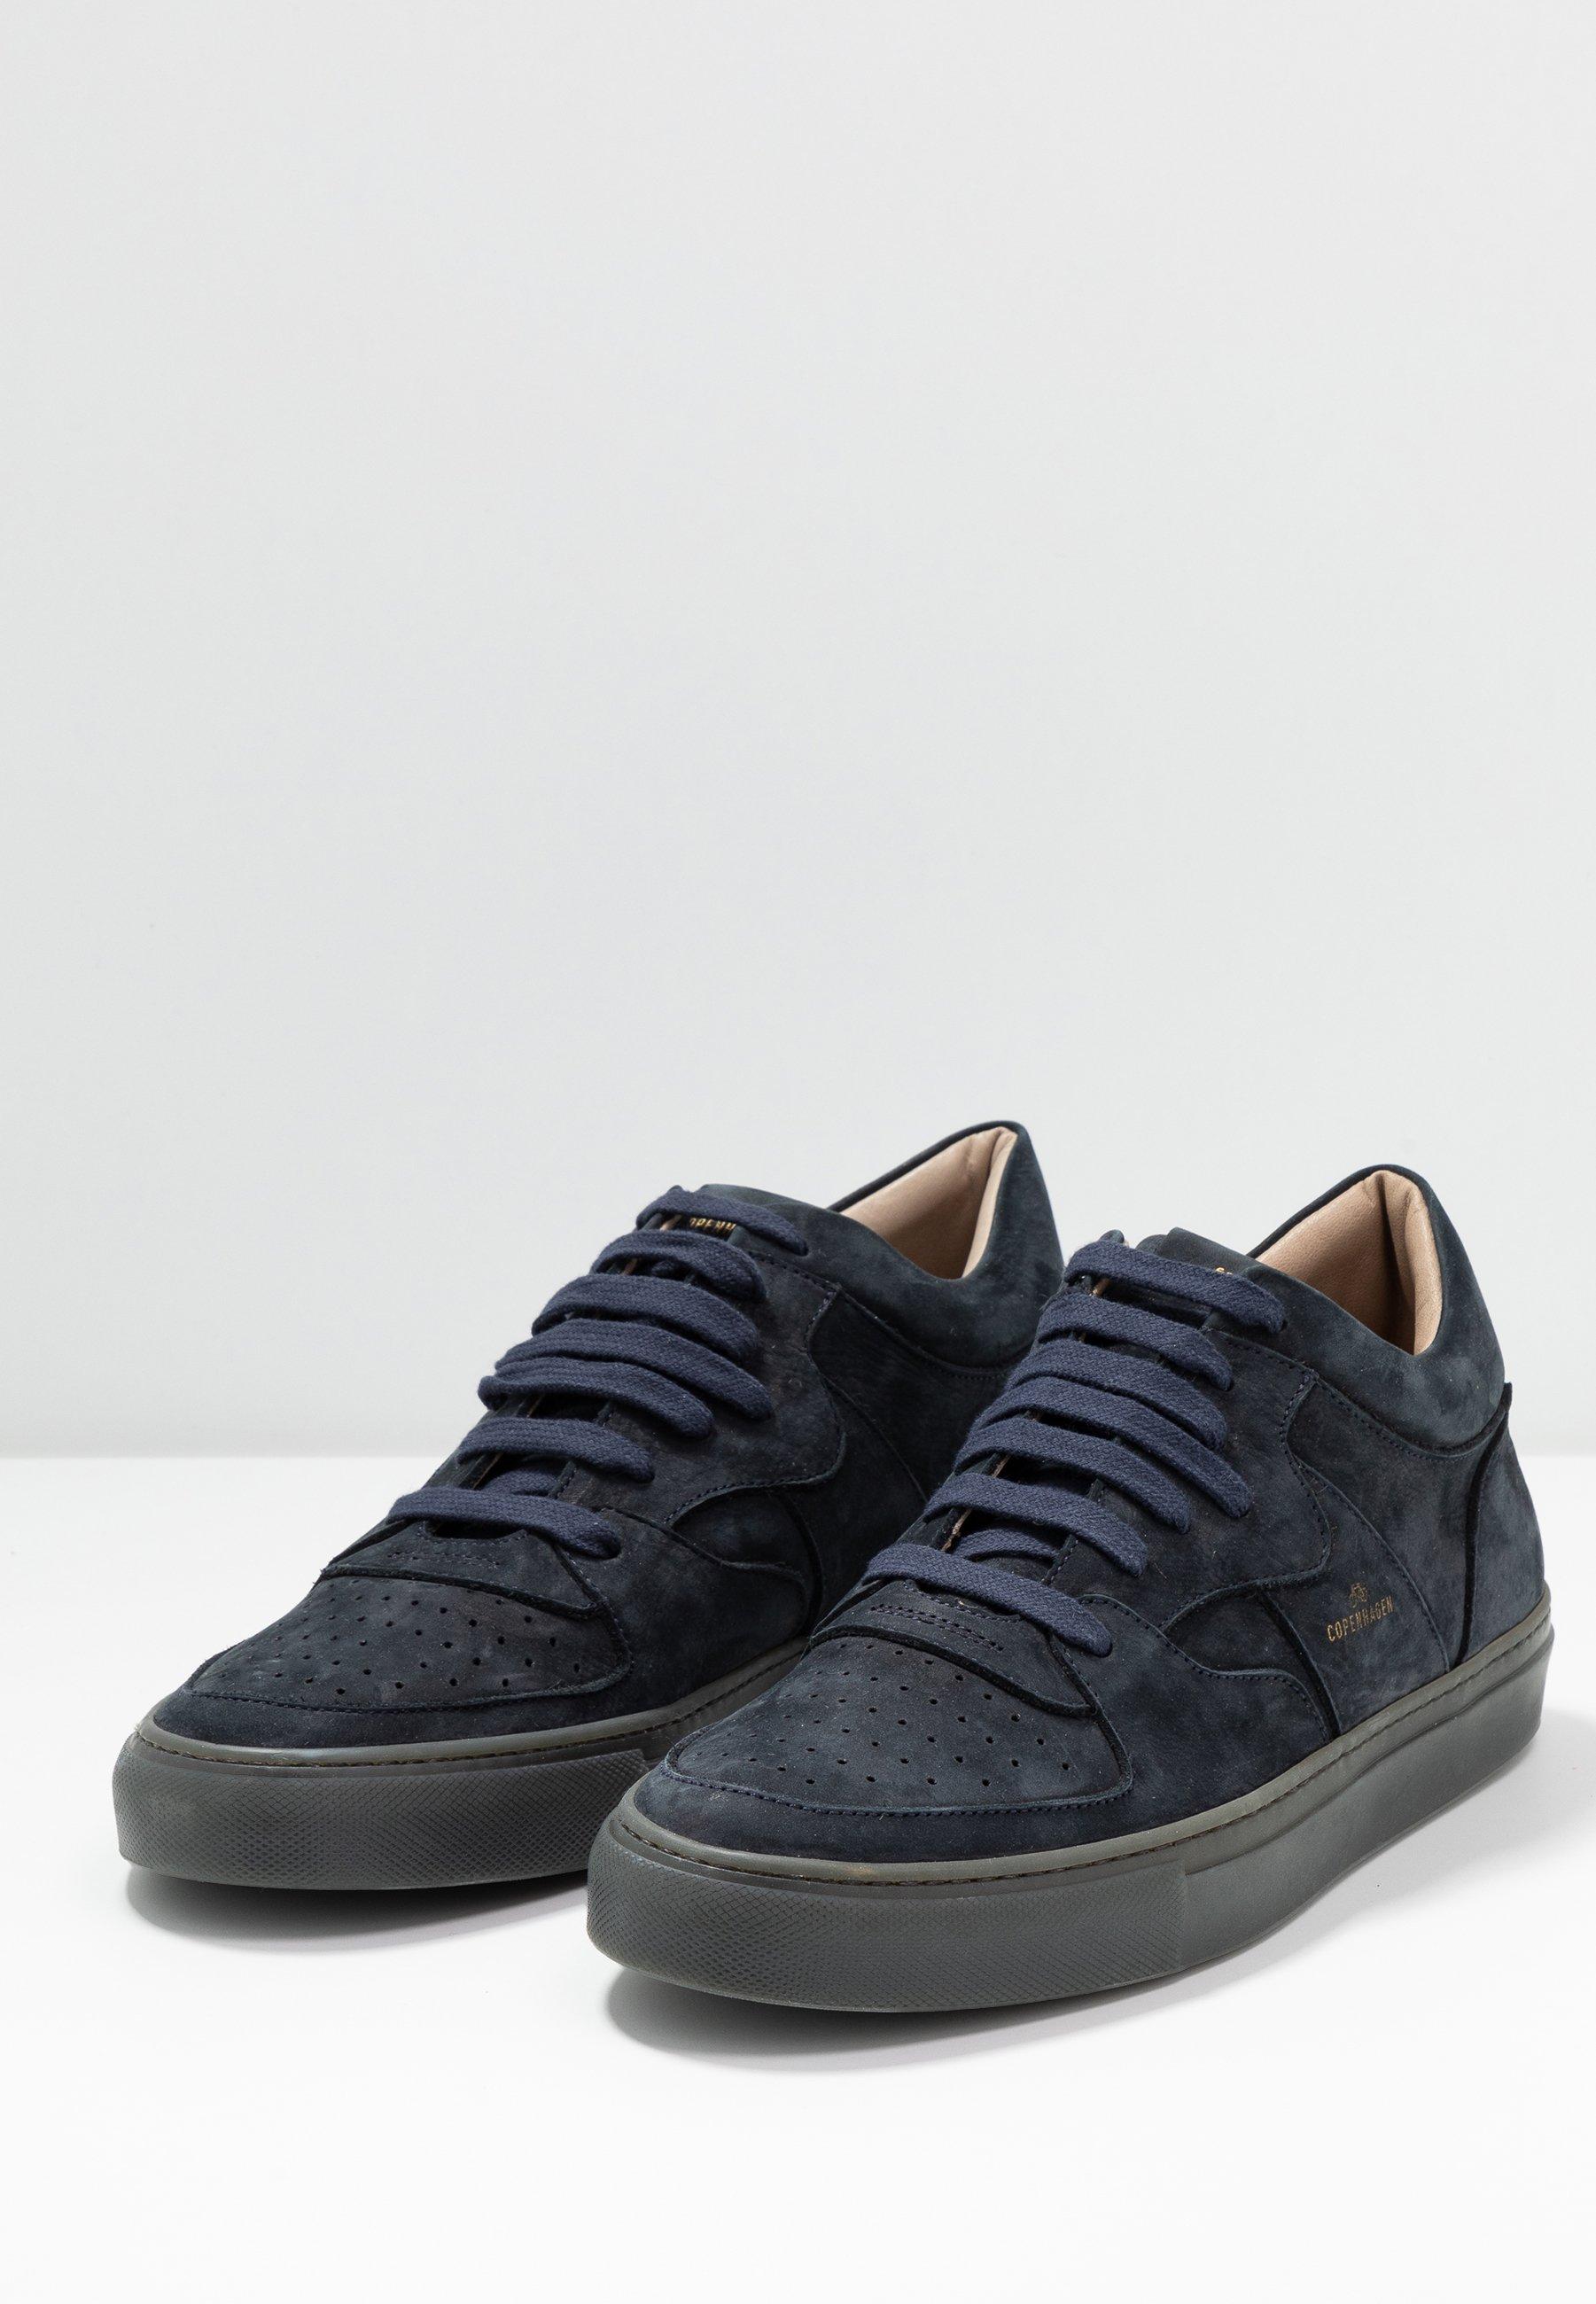 Copenhagen CPH753M - Sneaker low - night blue/dunkelblau - Herrenschuhe cic2H